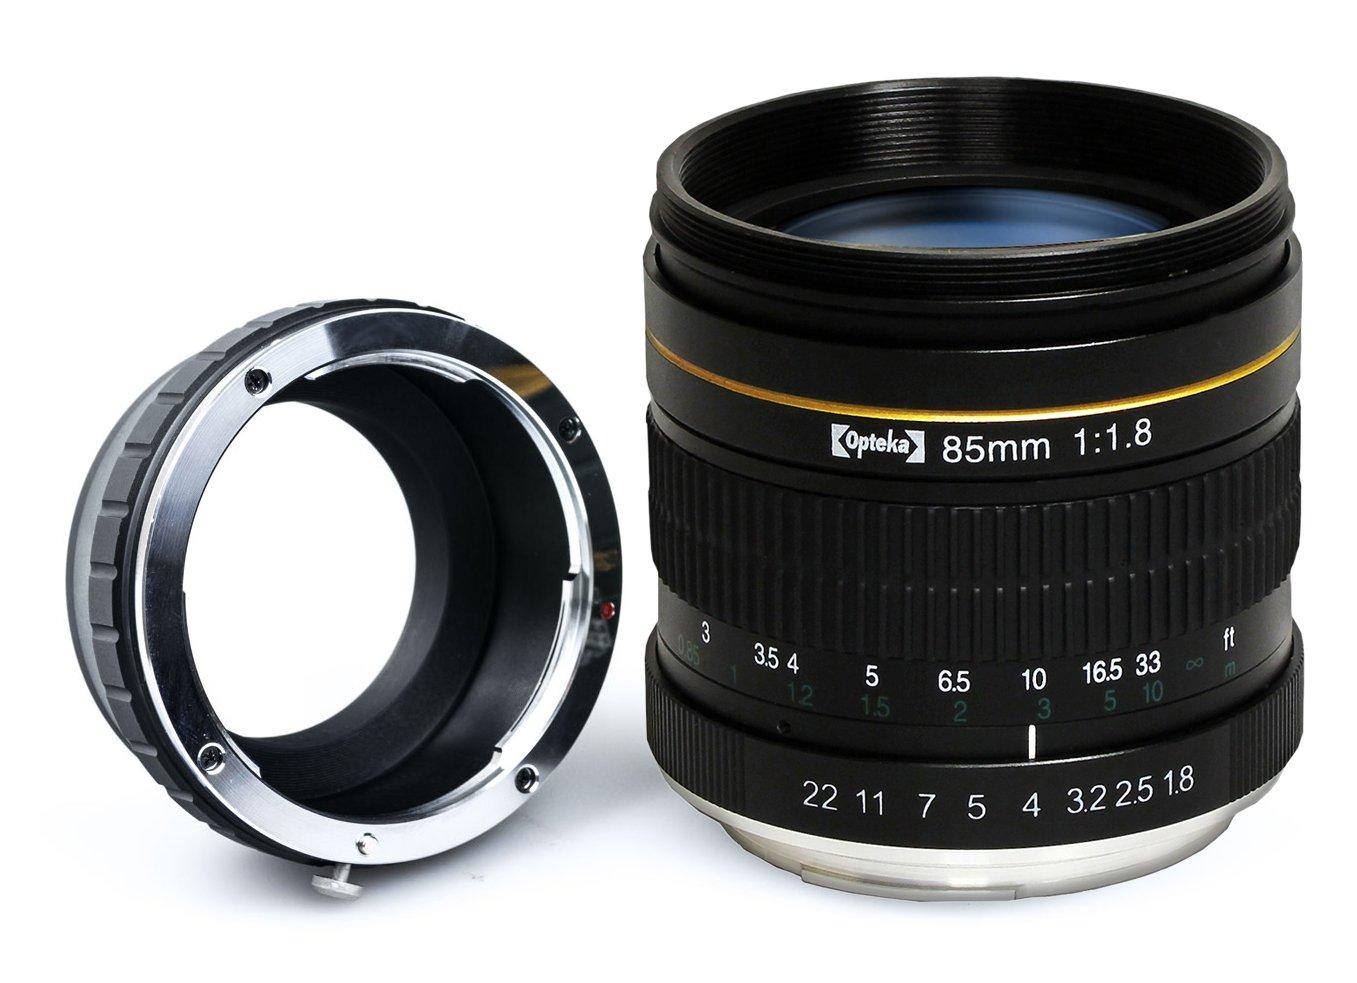 Opteka 85 mm f / 1.8マニュアルフォーカスAspherical Medium望遠ポートレートレンズfor Olympus e-pl7、p5、pl5、pm2、pl1、pl2 Micro Four Thirdsデジタルカメラ   B00W87USSM